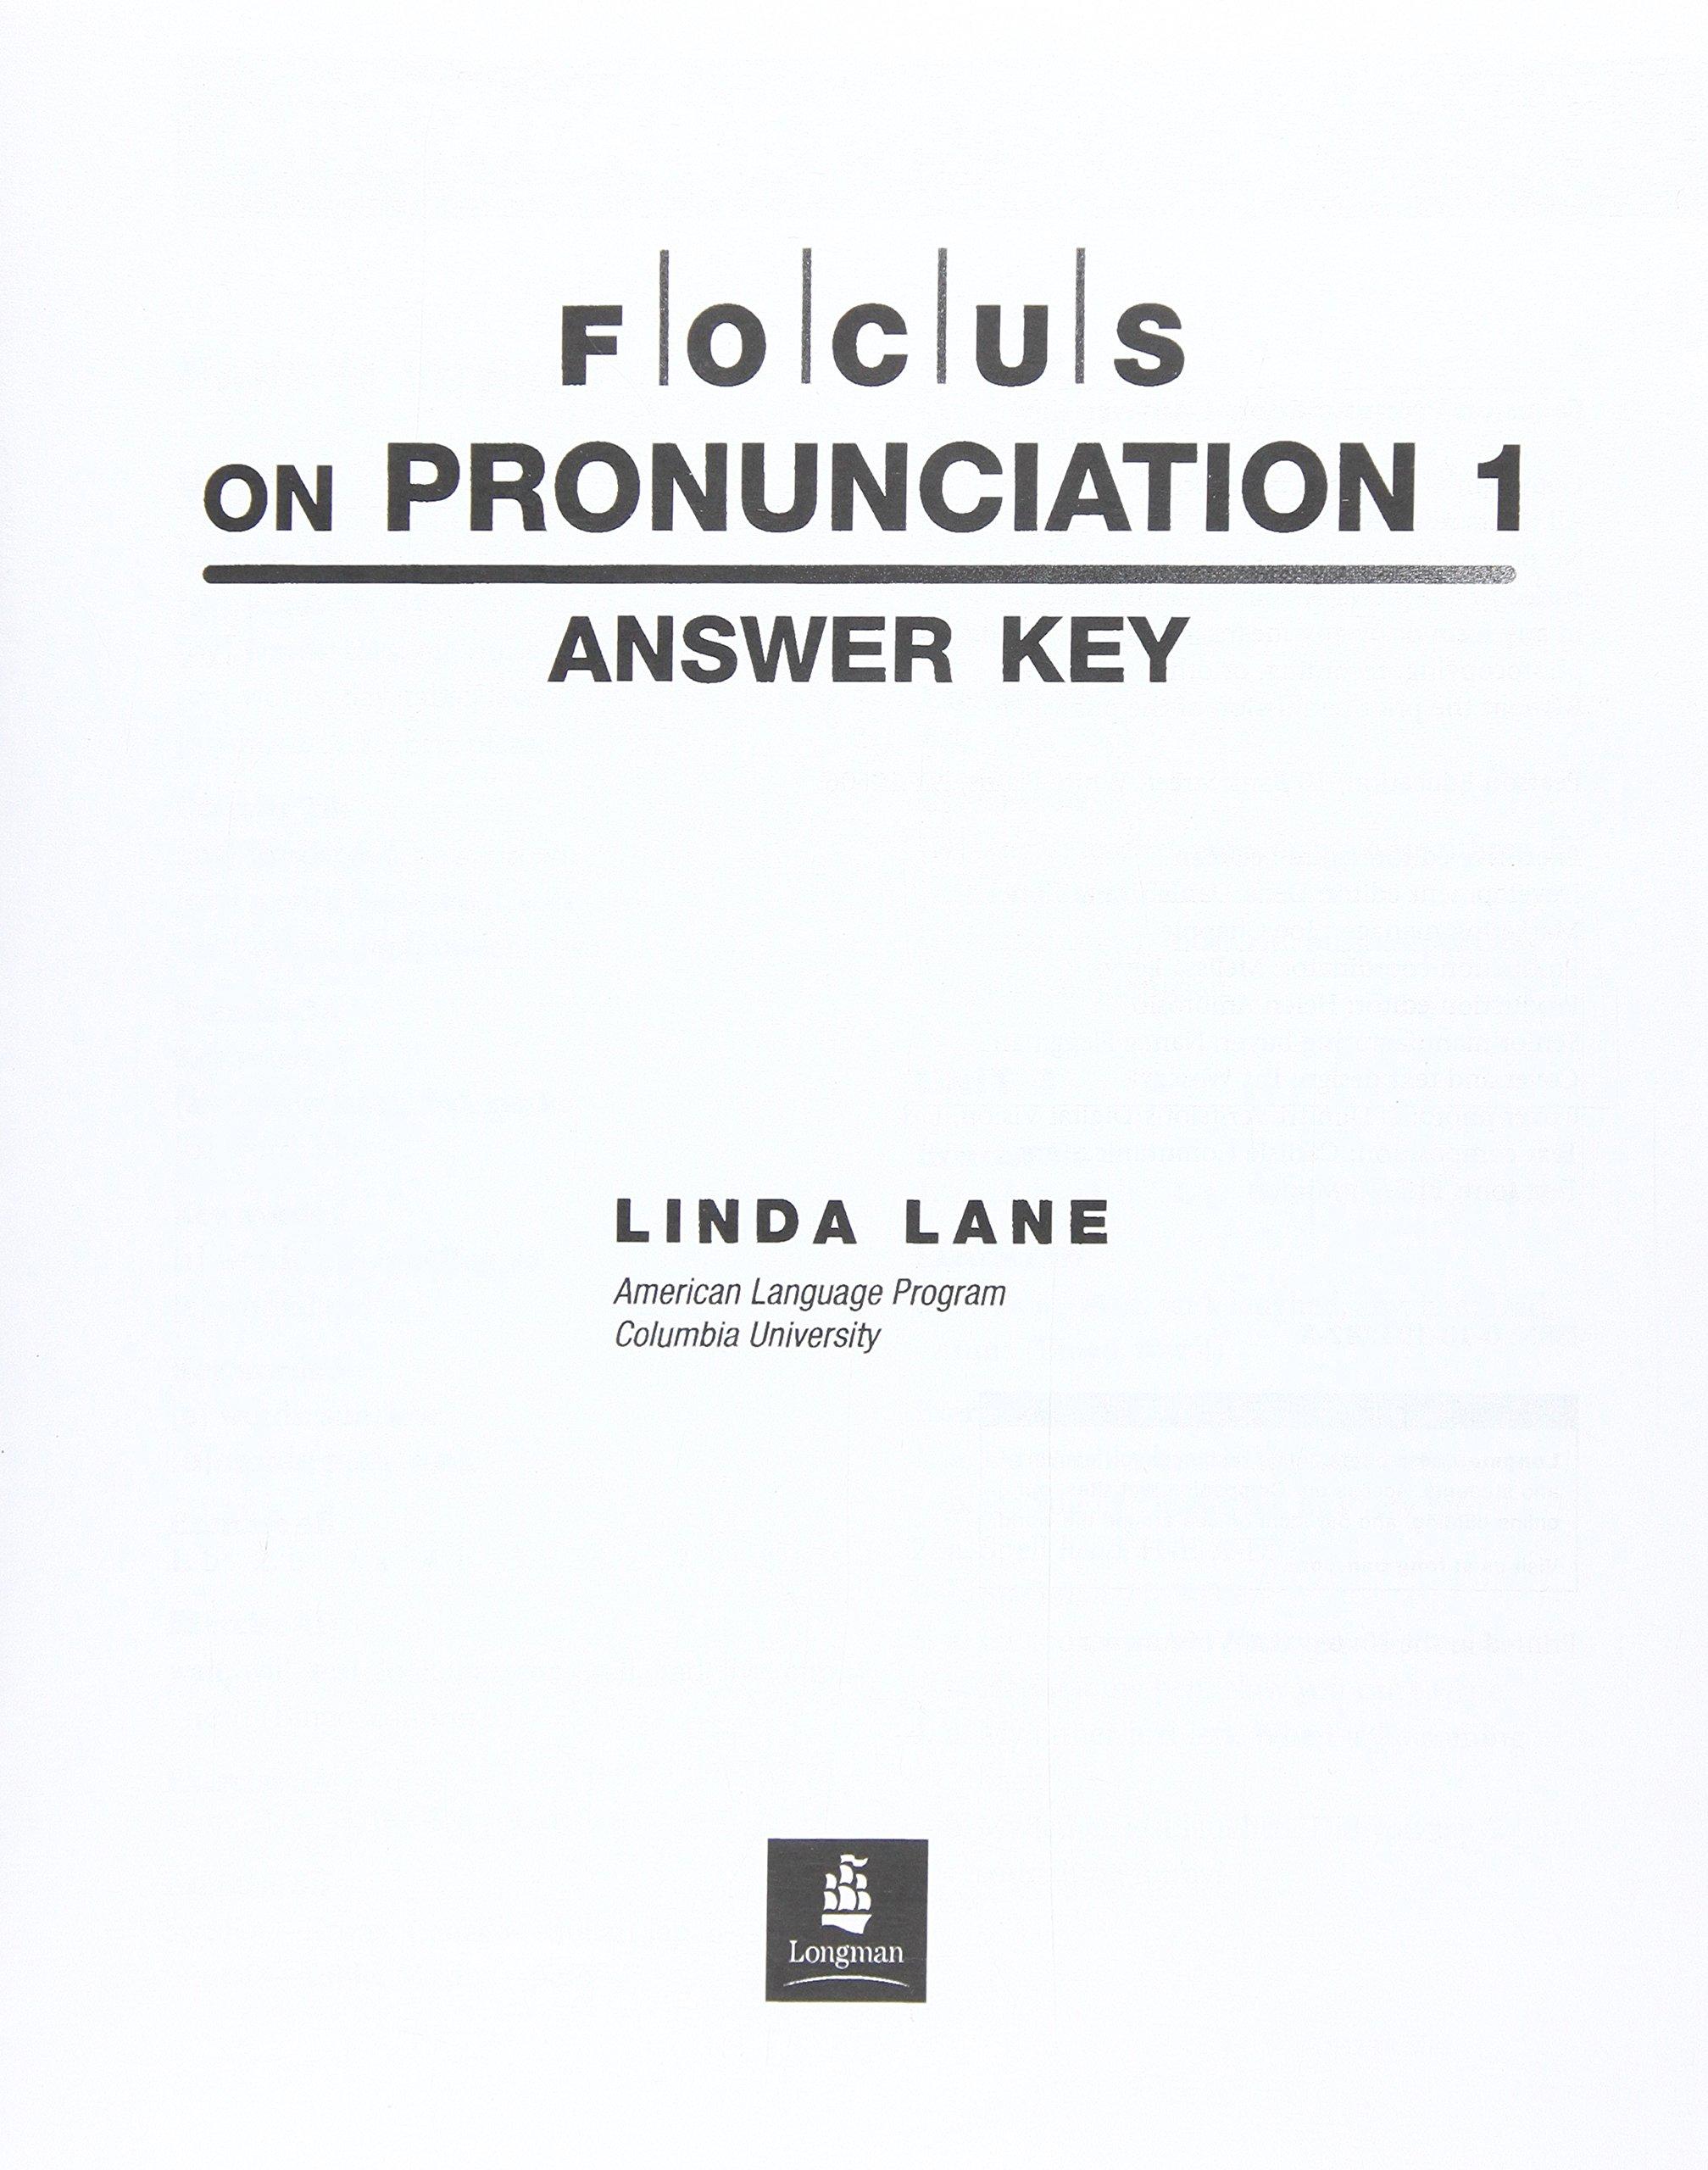 Focus on Pronunciation: Answer Key and Audio Script Pt.1 ebook